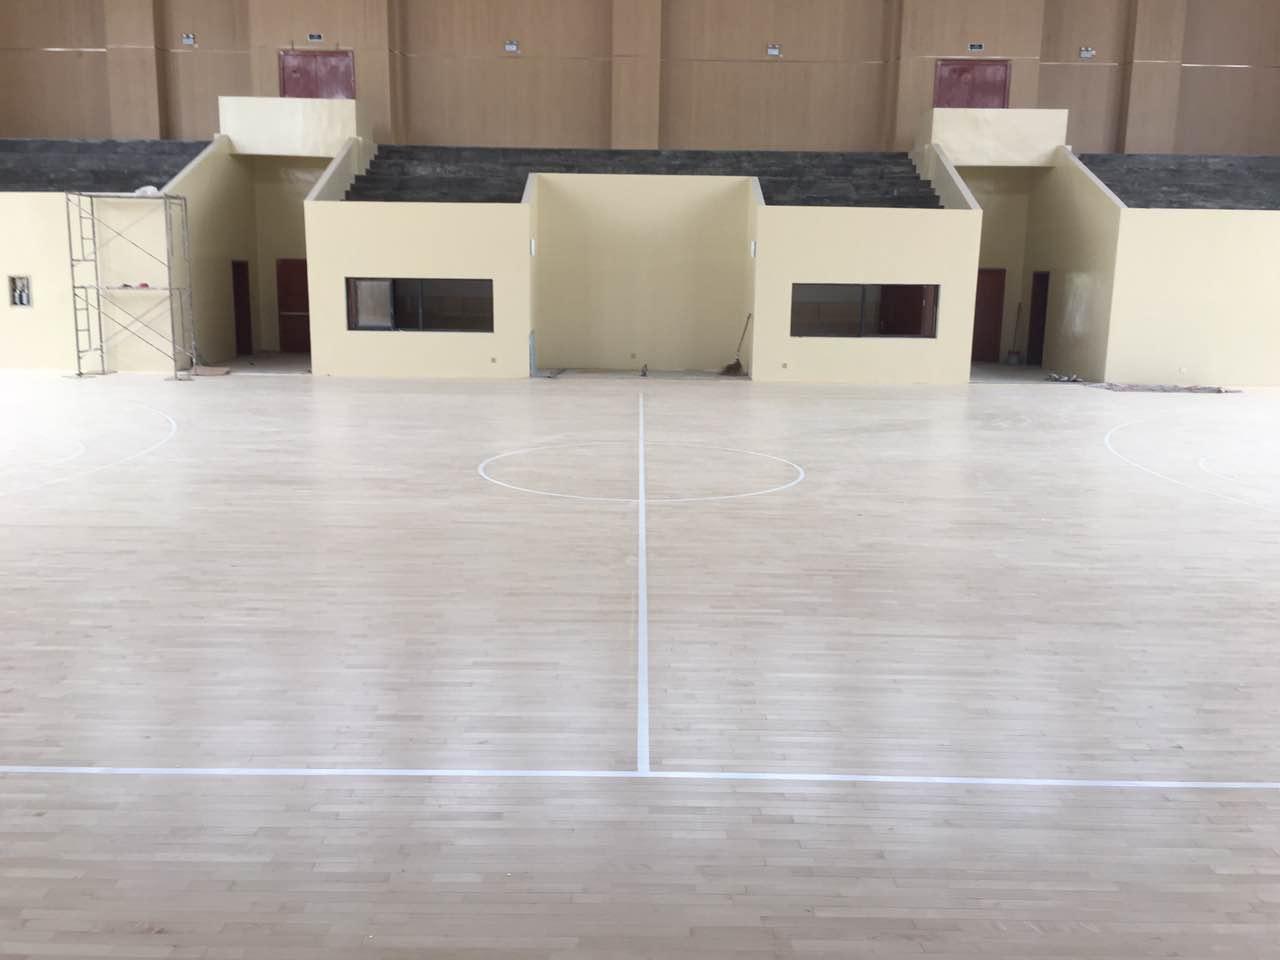 fu建省雷甸镇中心小学篮qiu馆项目